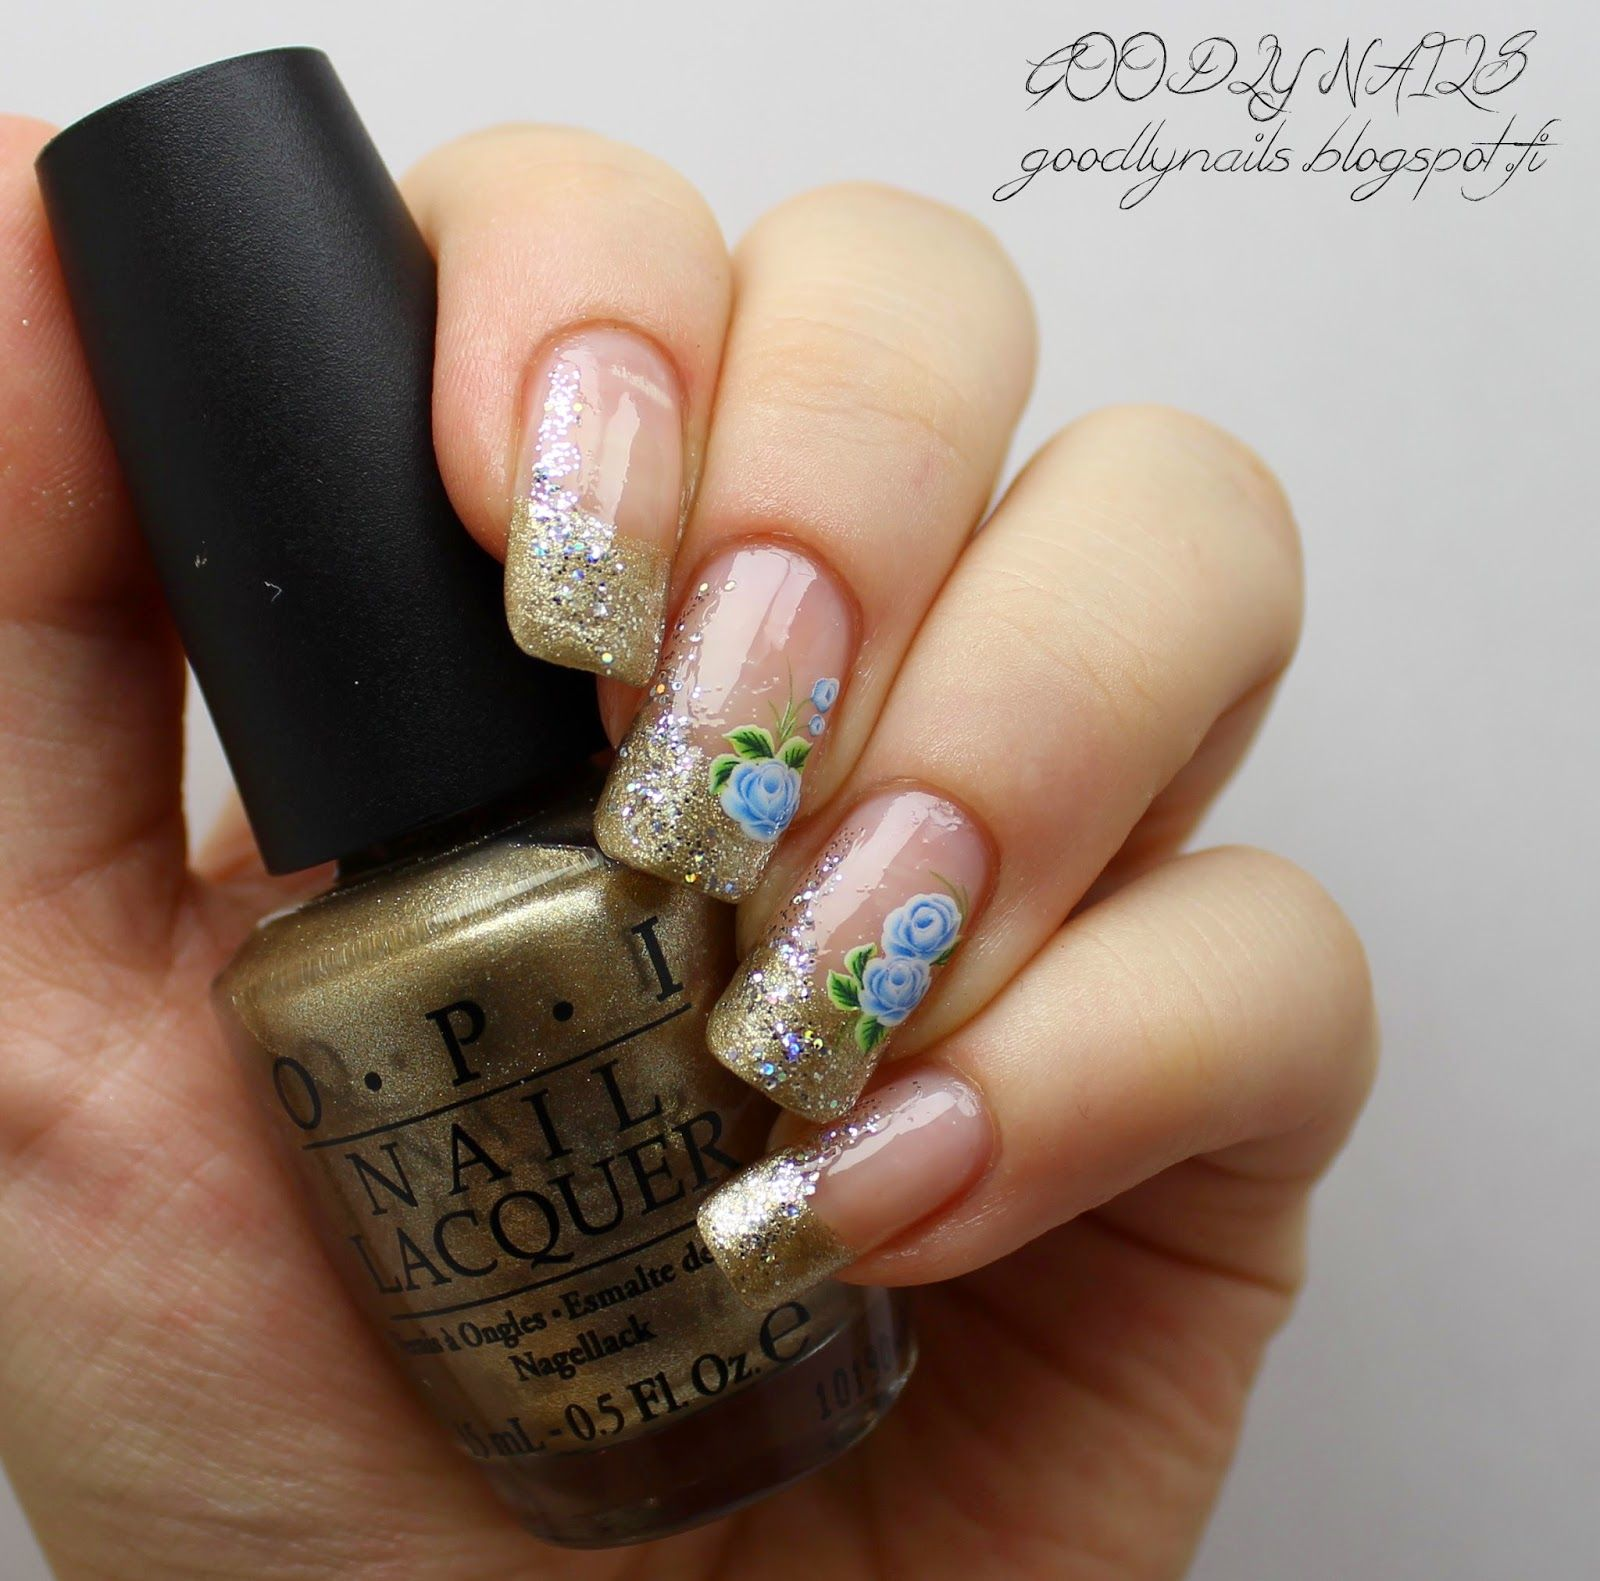 Goodly Nails: Glitzerland